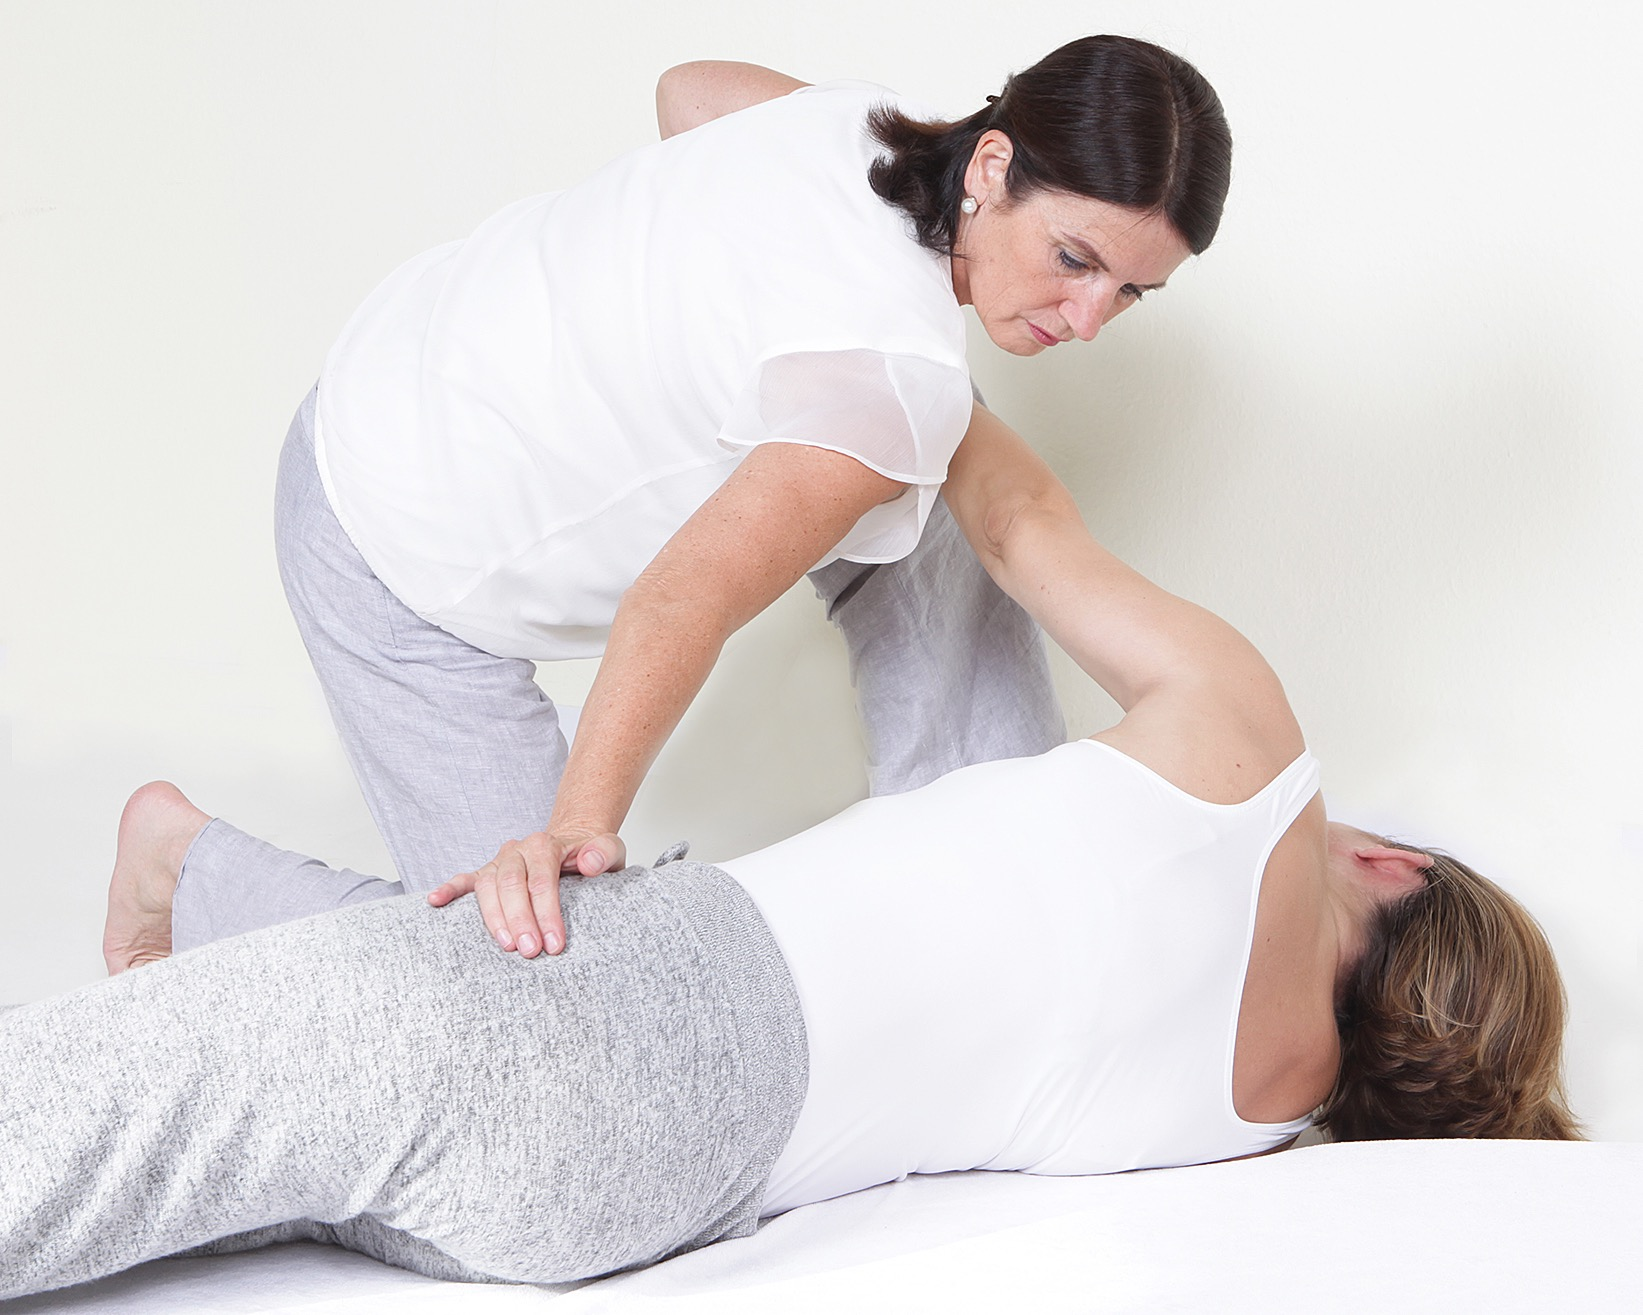 Bewegungstherapie korrigiert eingefahrene Bewegungsmuster.